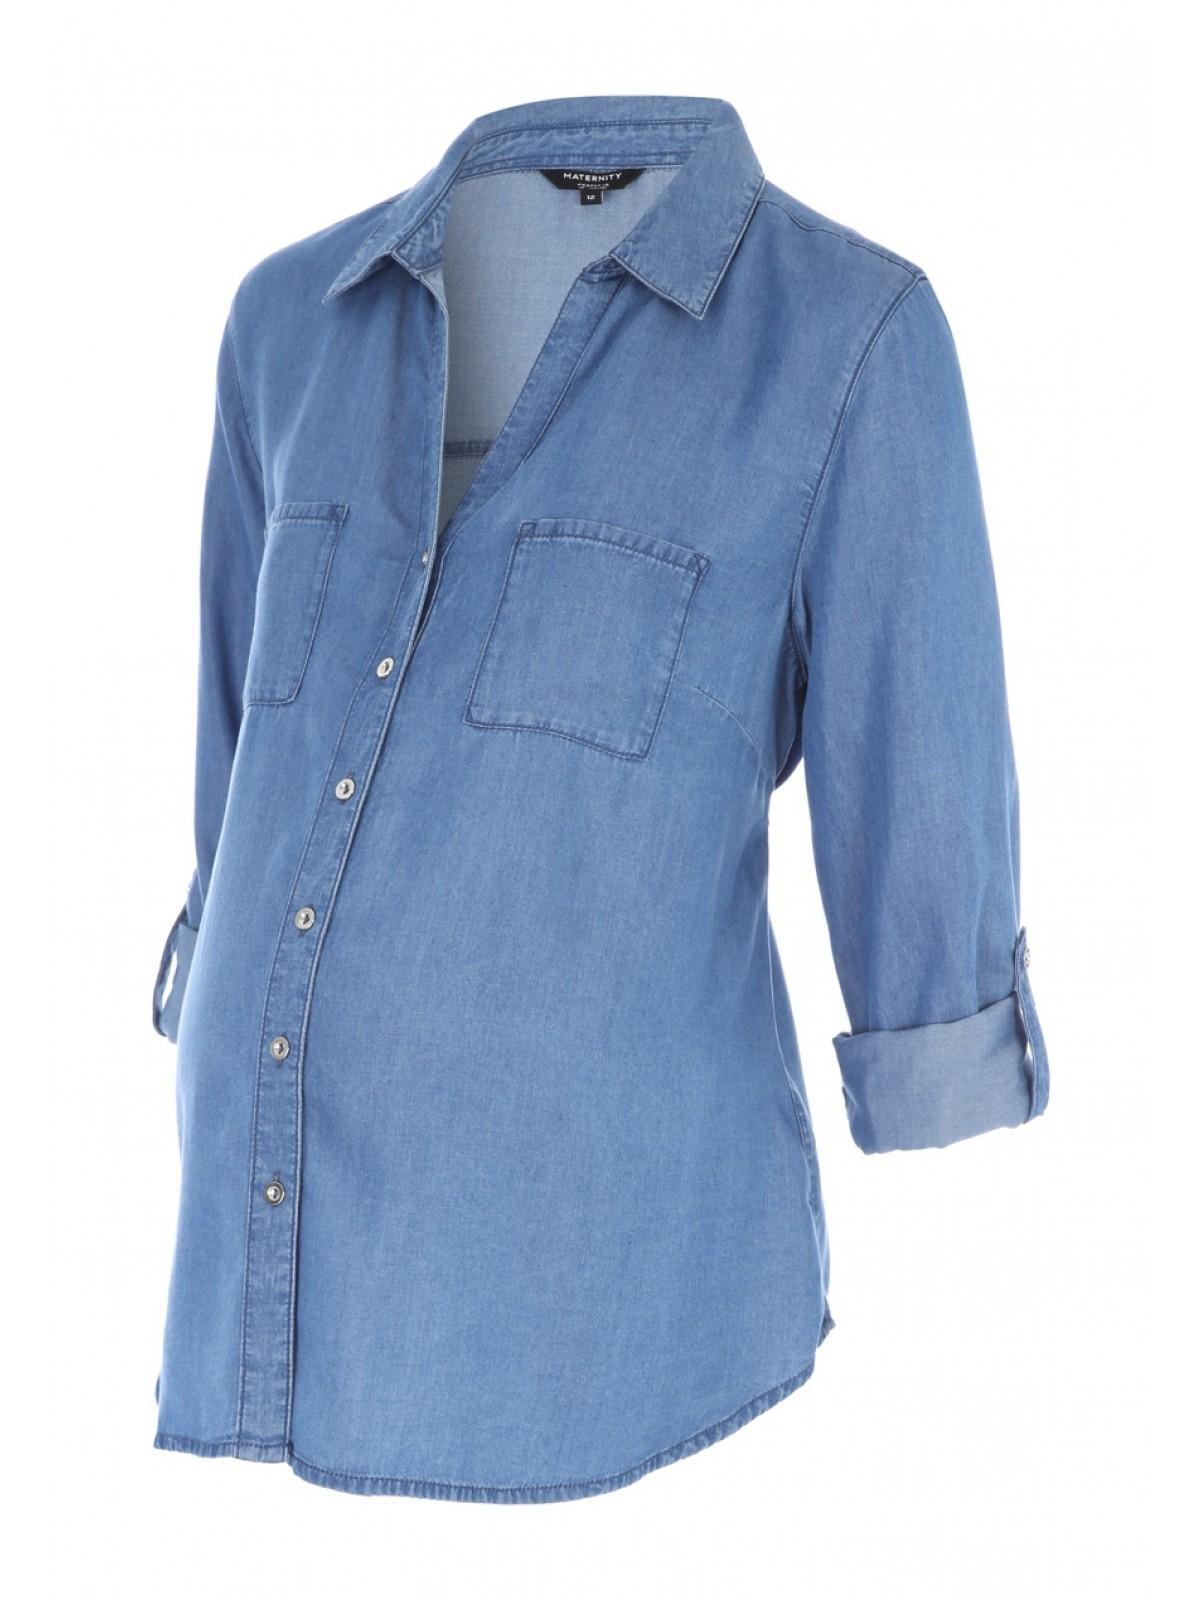 c3a20559f46cc Home; Maternity Blue Tencel Denim Shirt. Back. PreviousNext